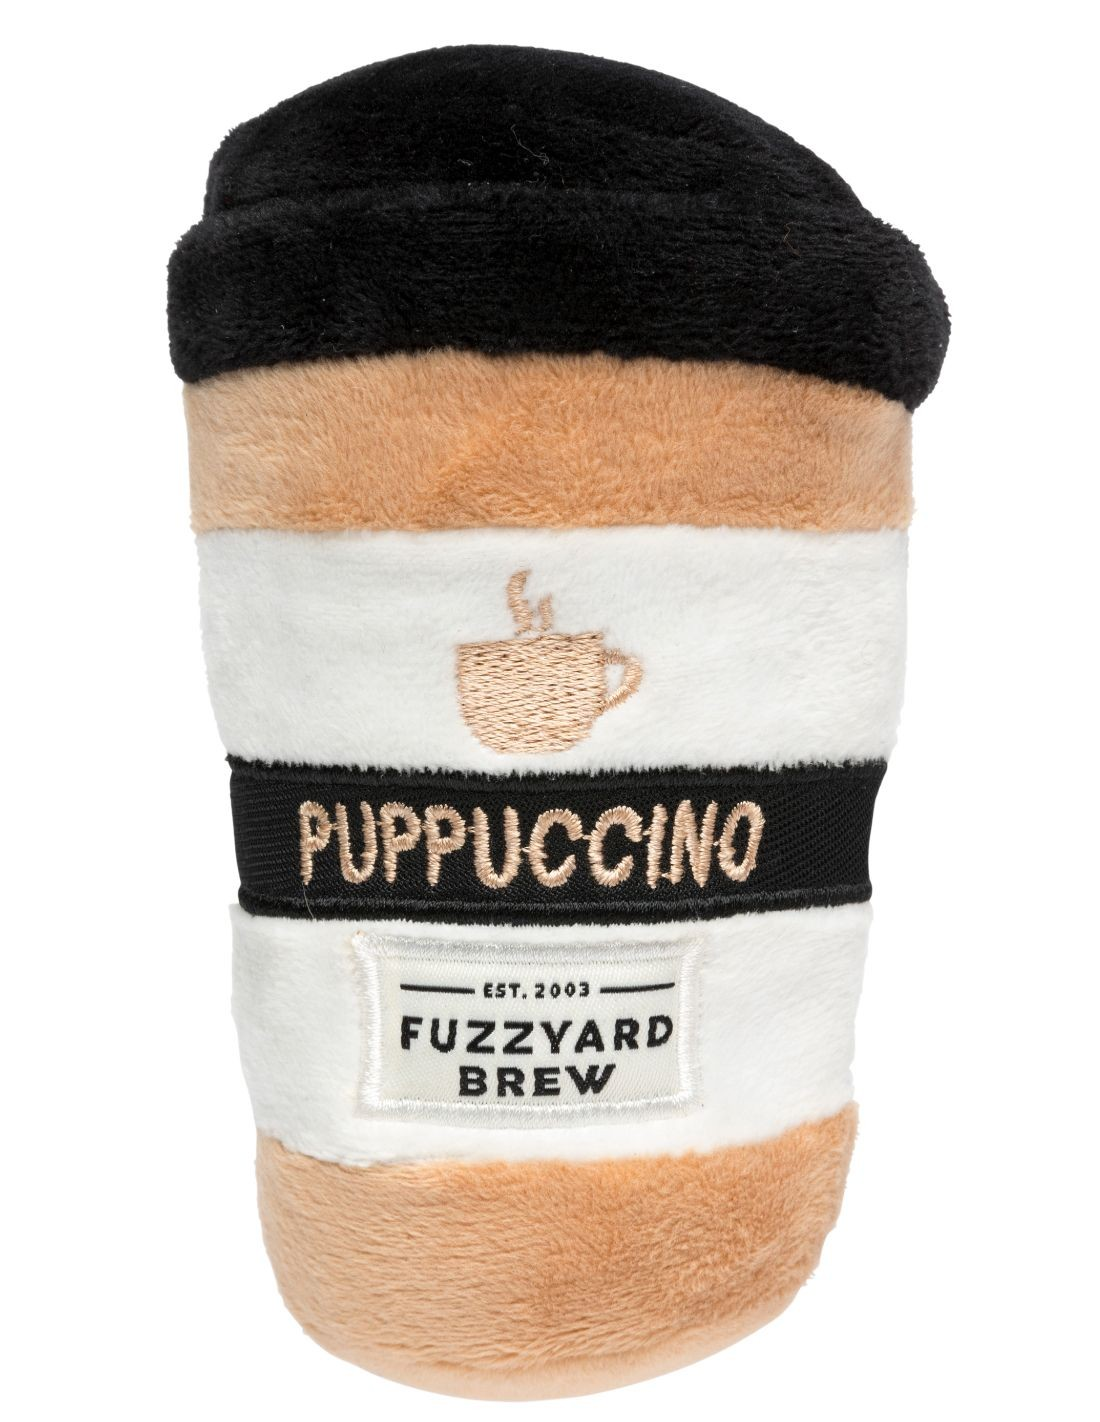 FUZZYARD Puppuccino Coffee - Peluche para perro